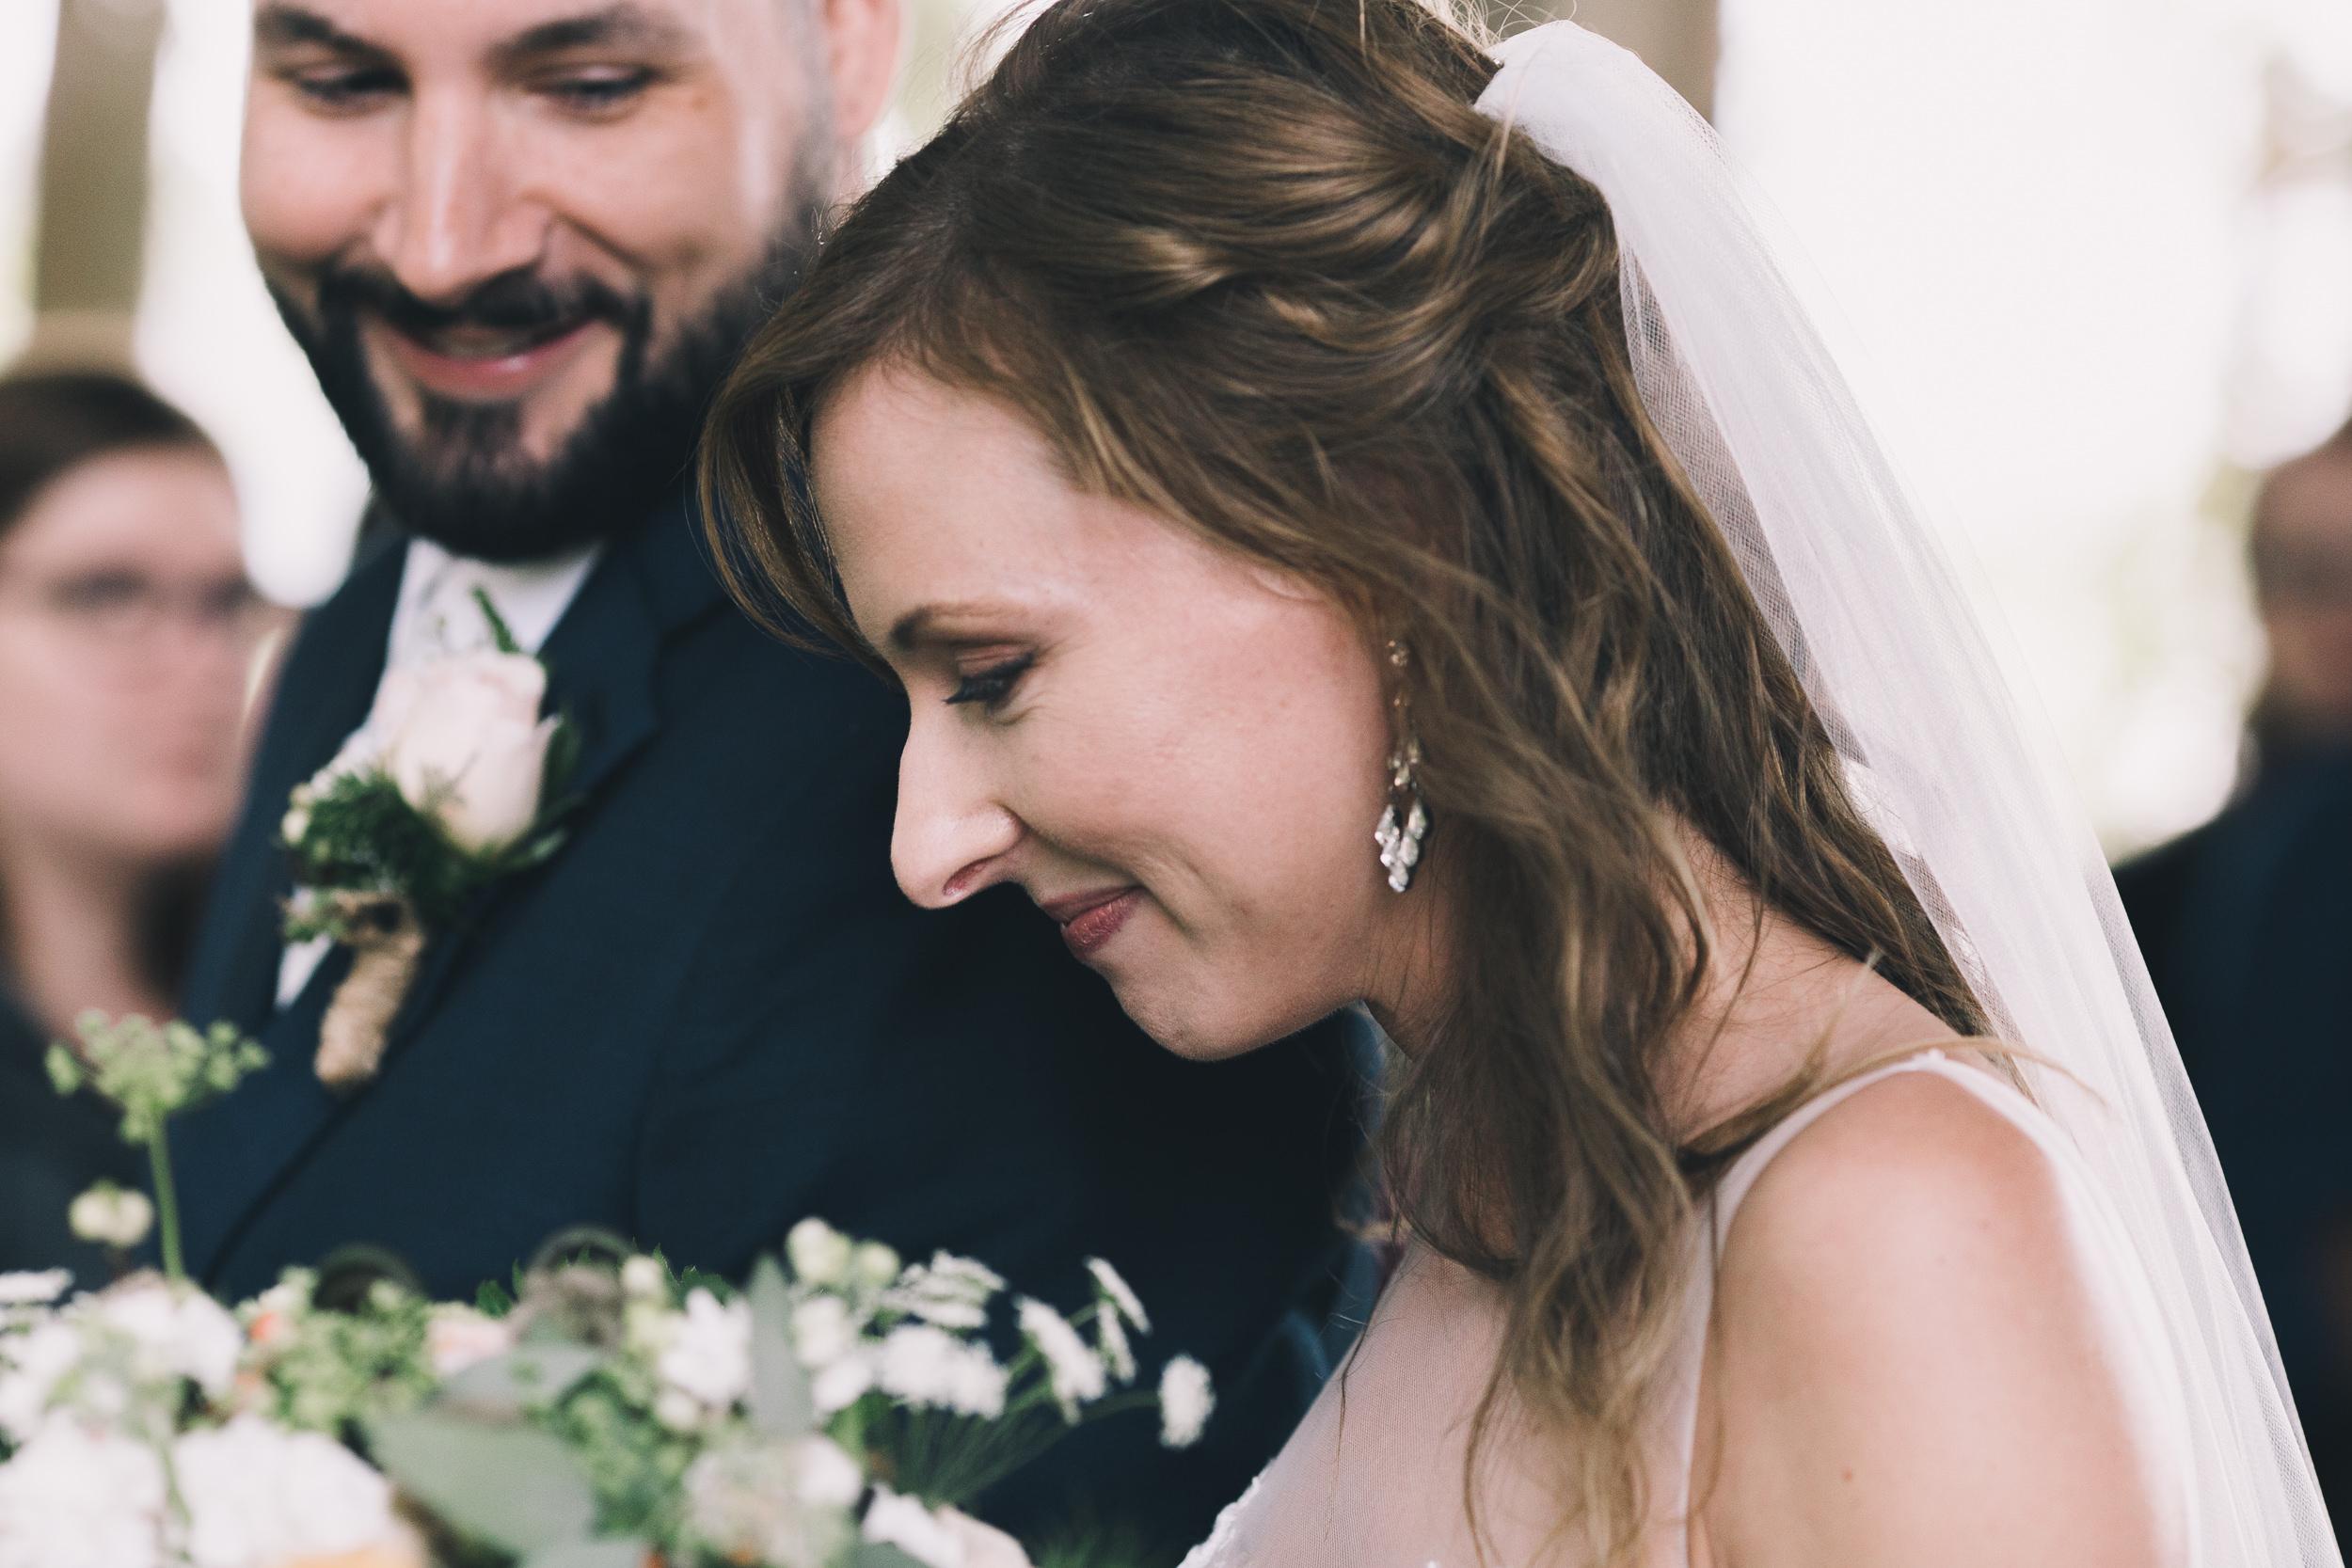 kitsap memorial state park groom looks lovingly at bride